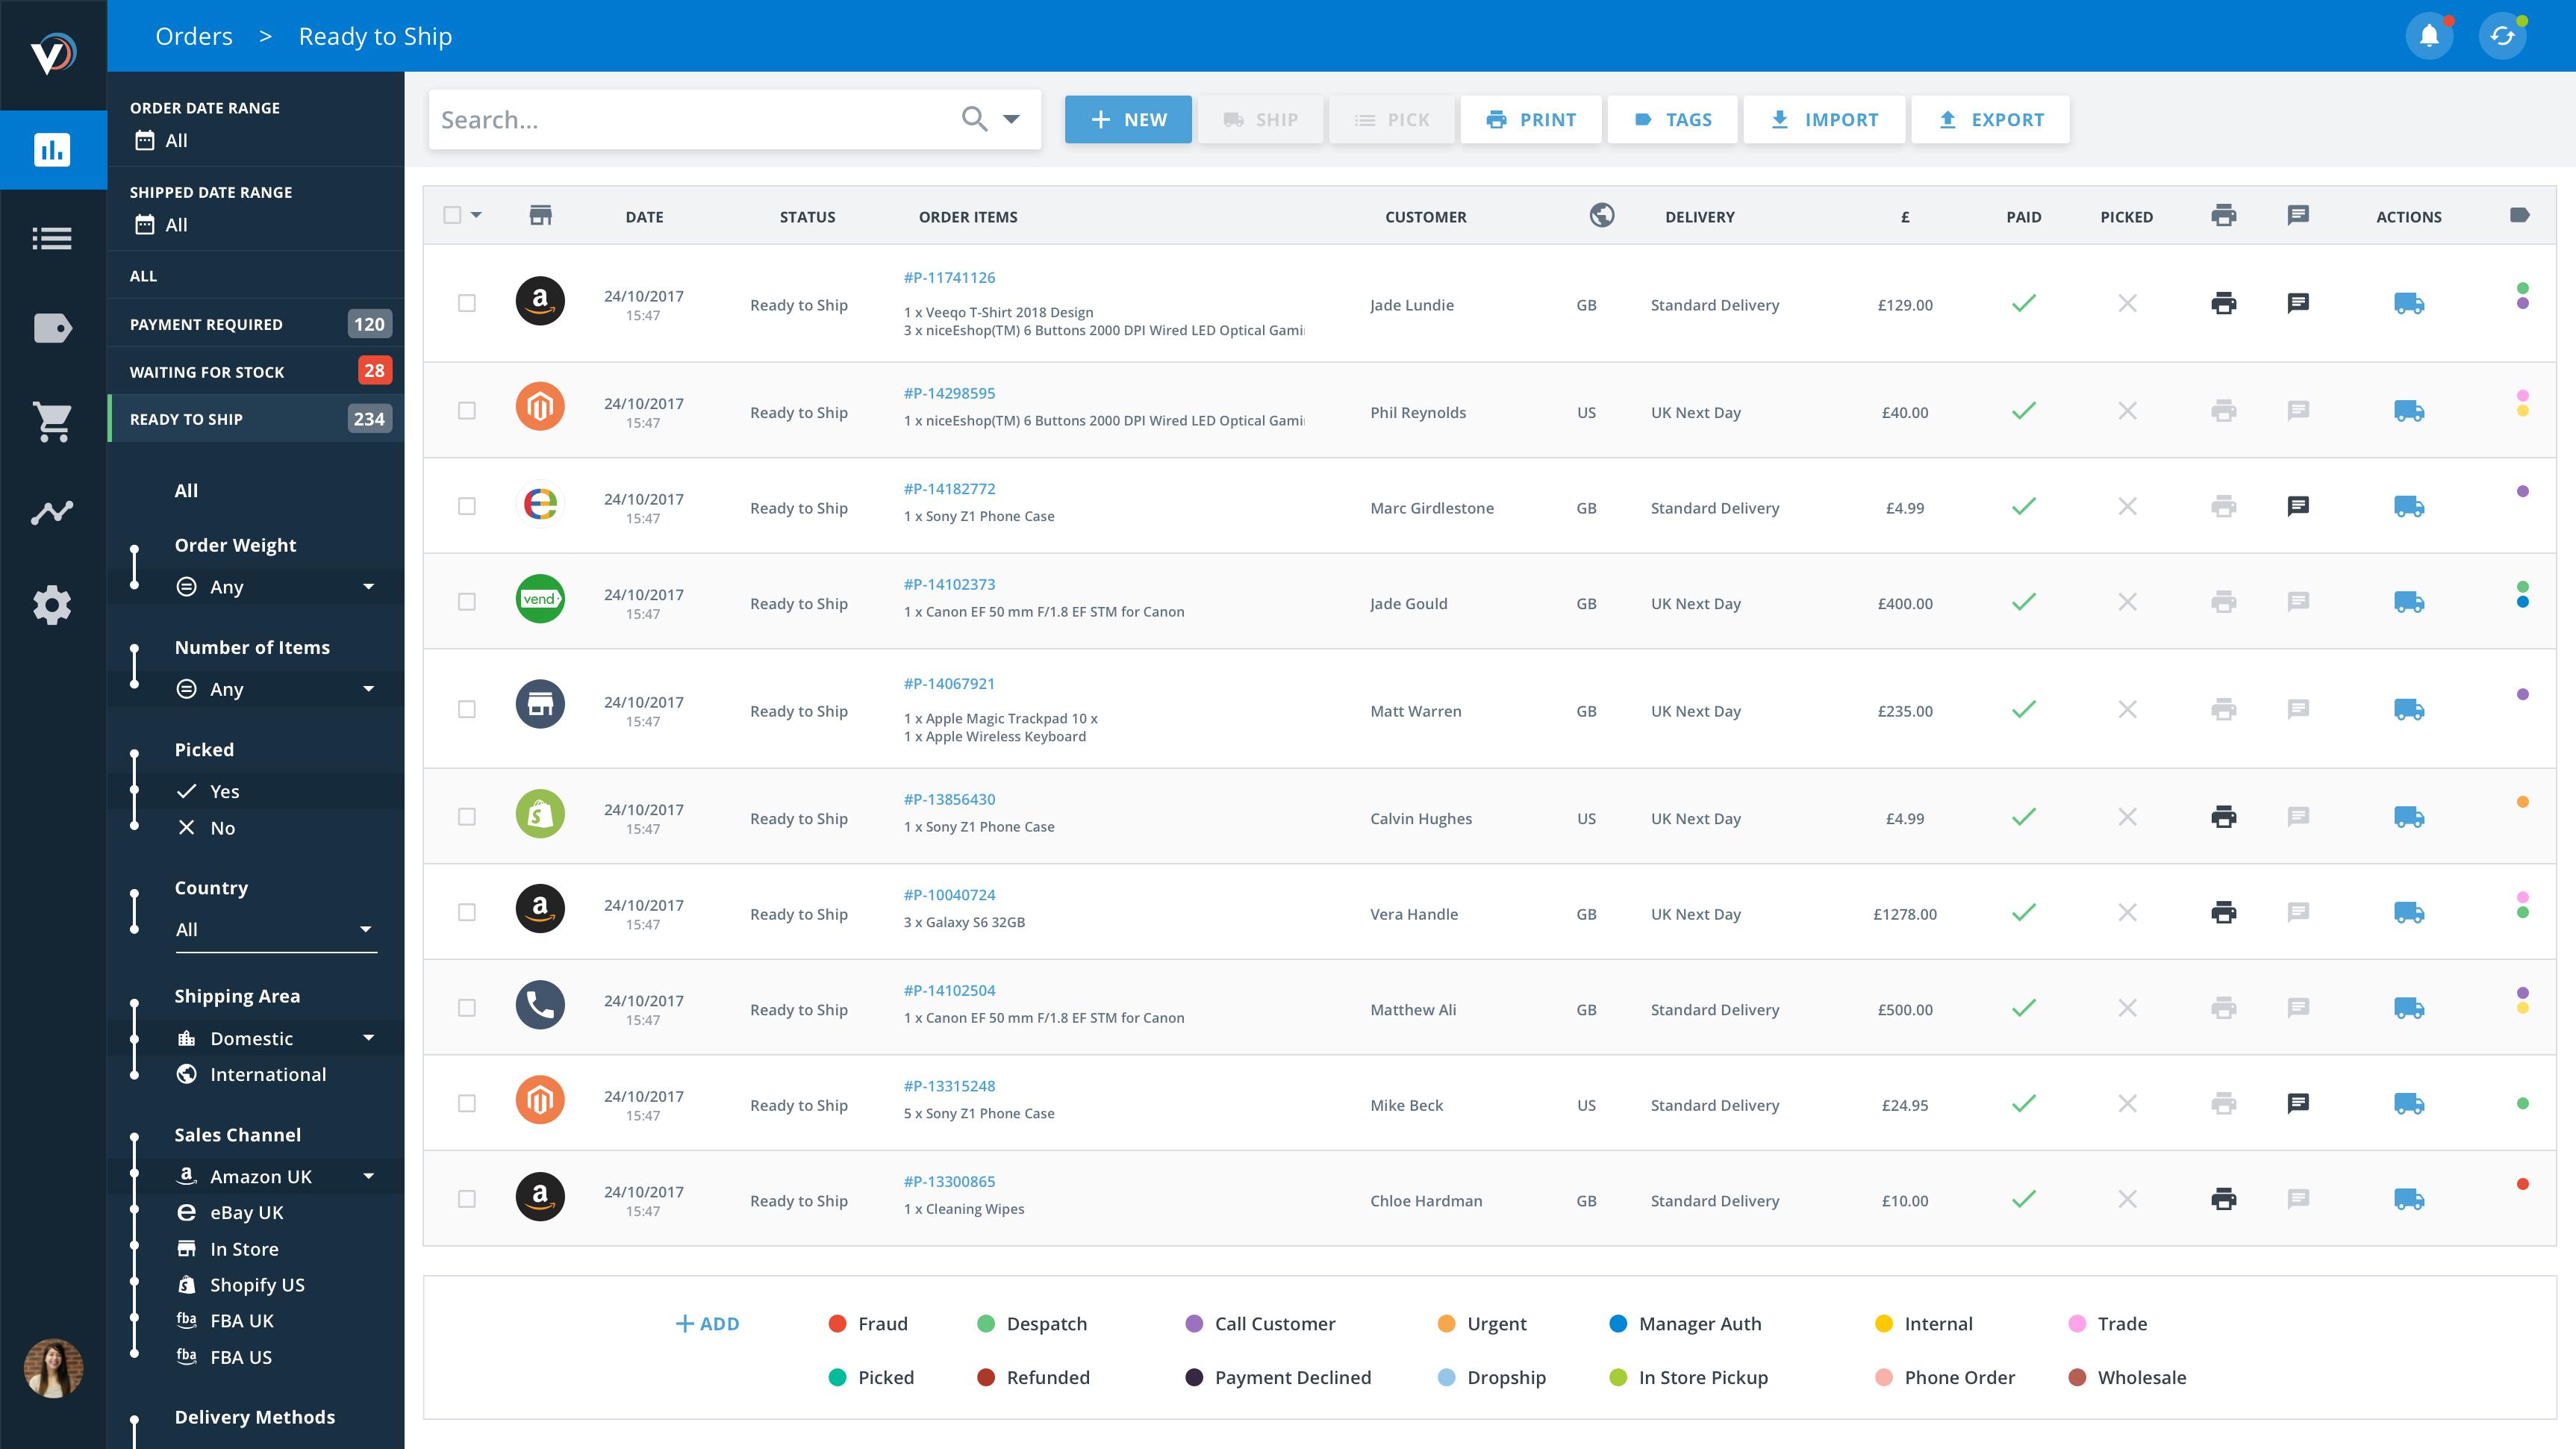 Veeqo Software - Orders Screen